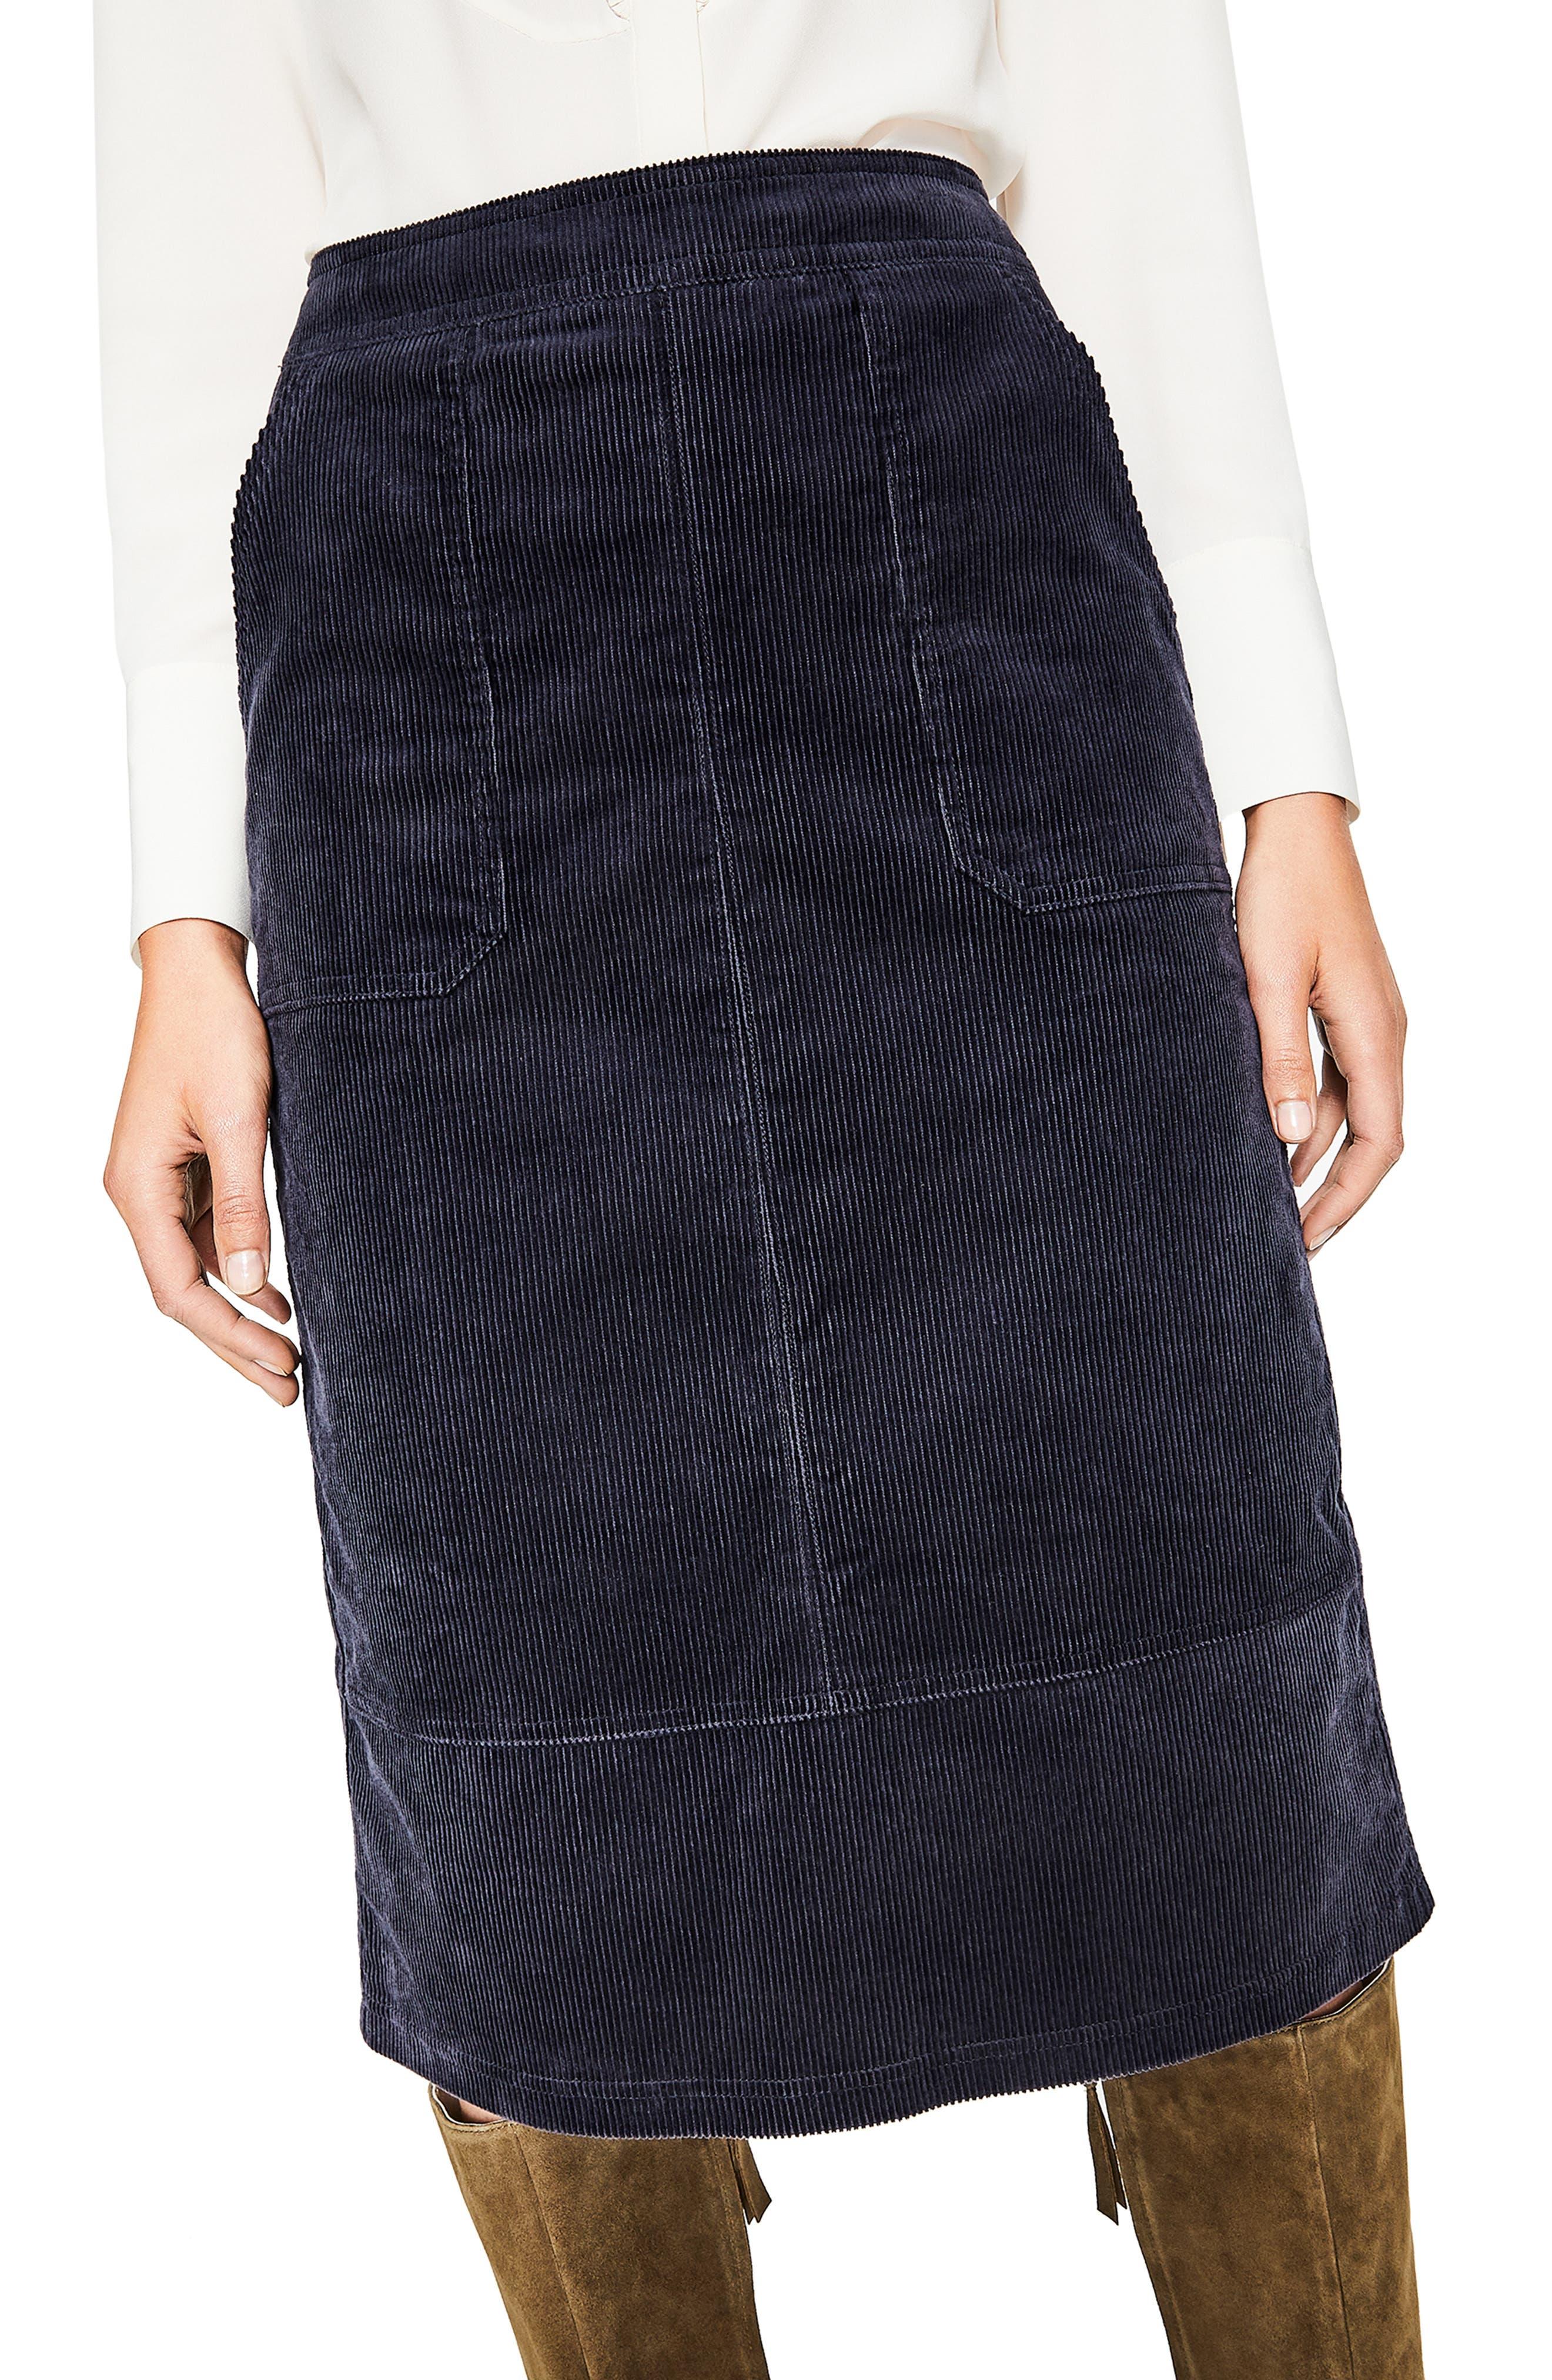 Patch Pocket Corduroy Midi Skirt,                             Alternate thumbnail 4, color,                             024